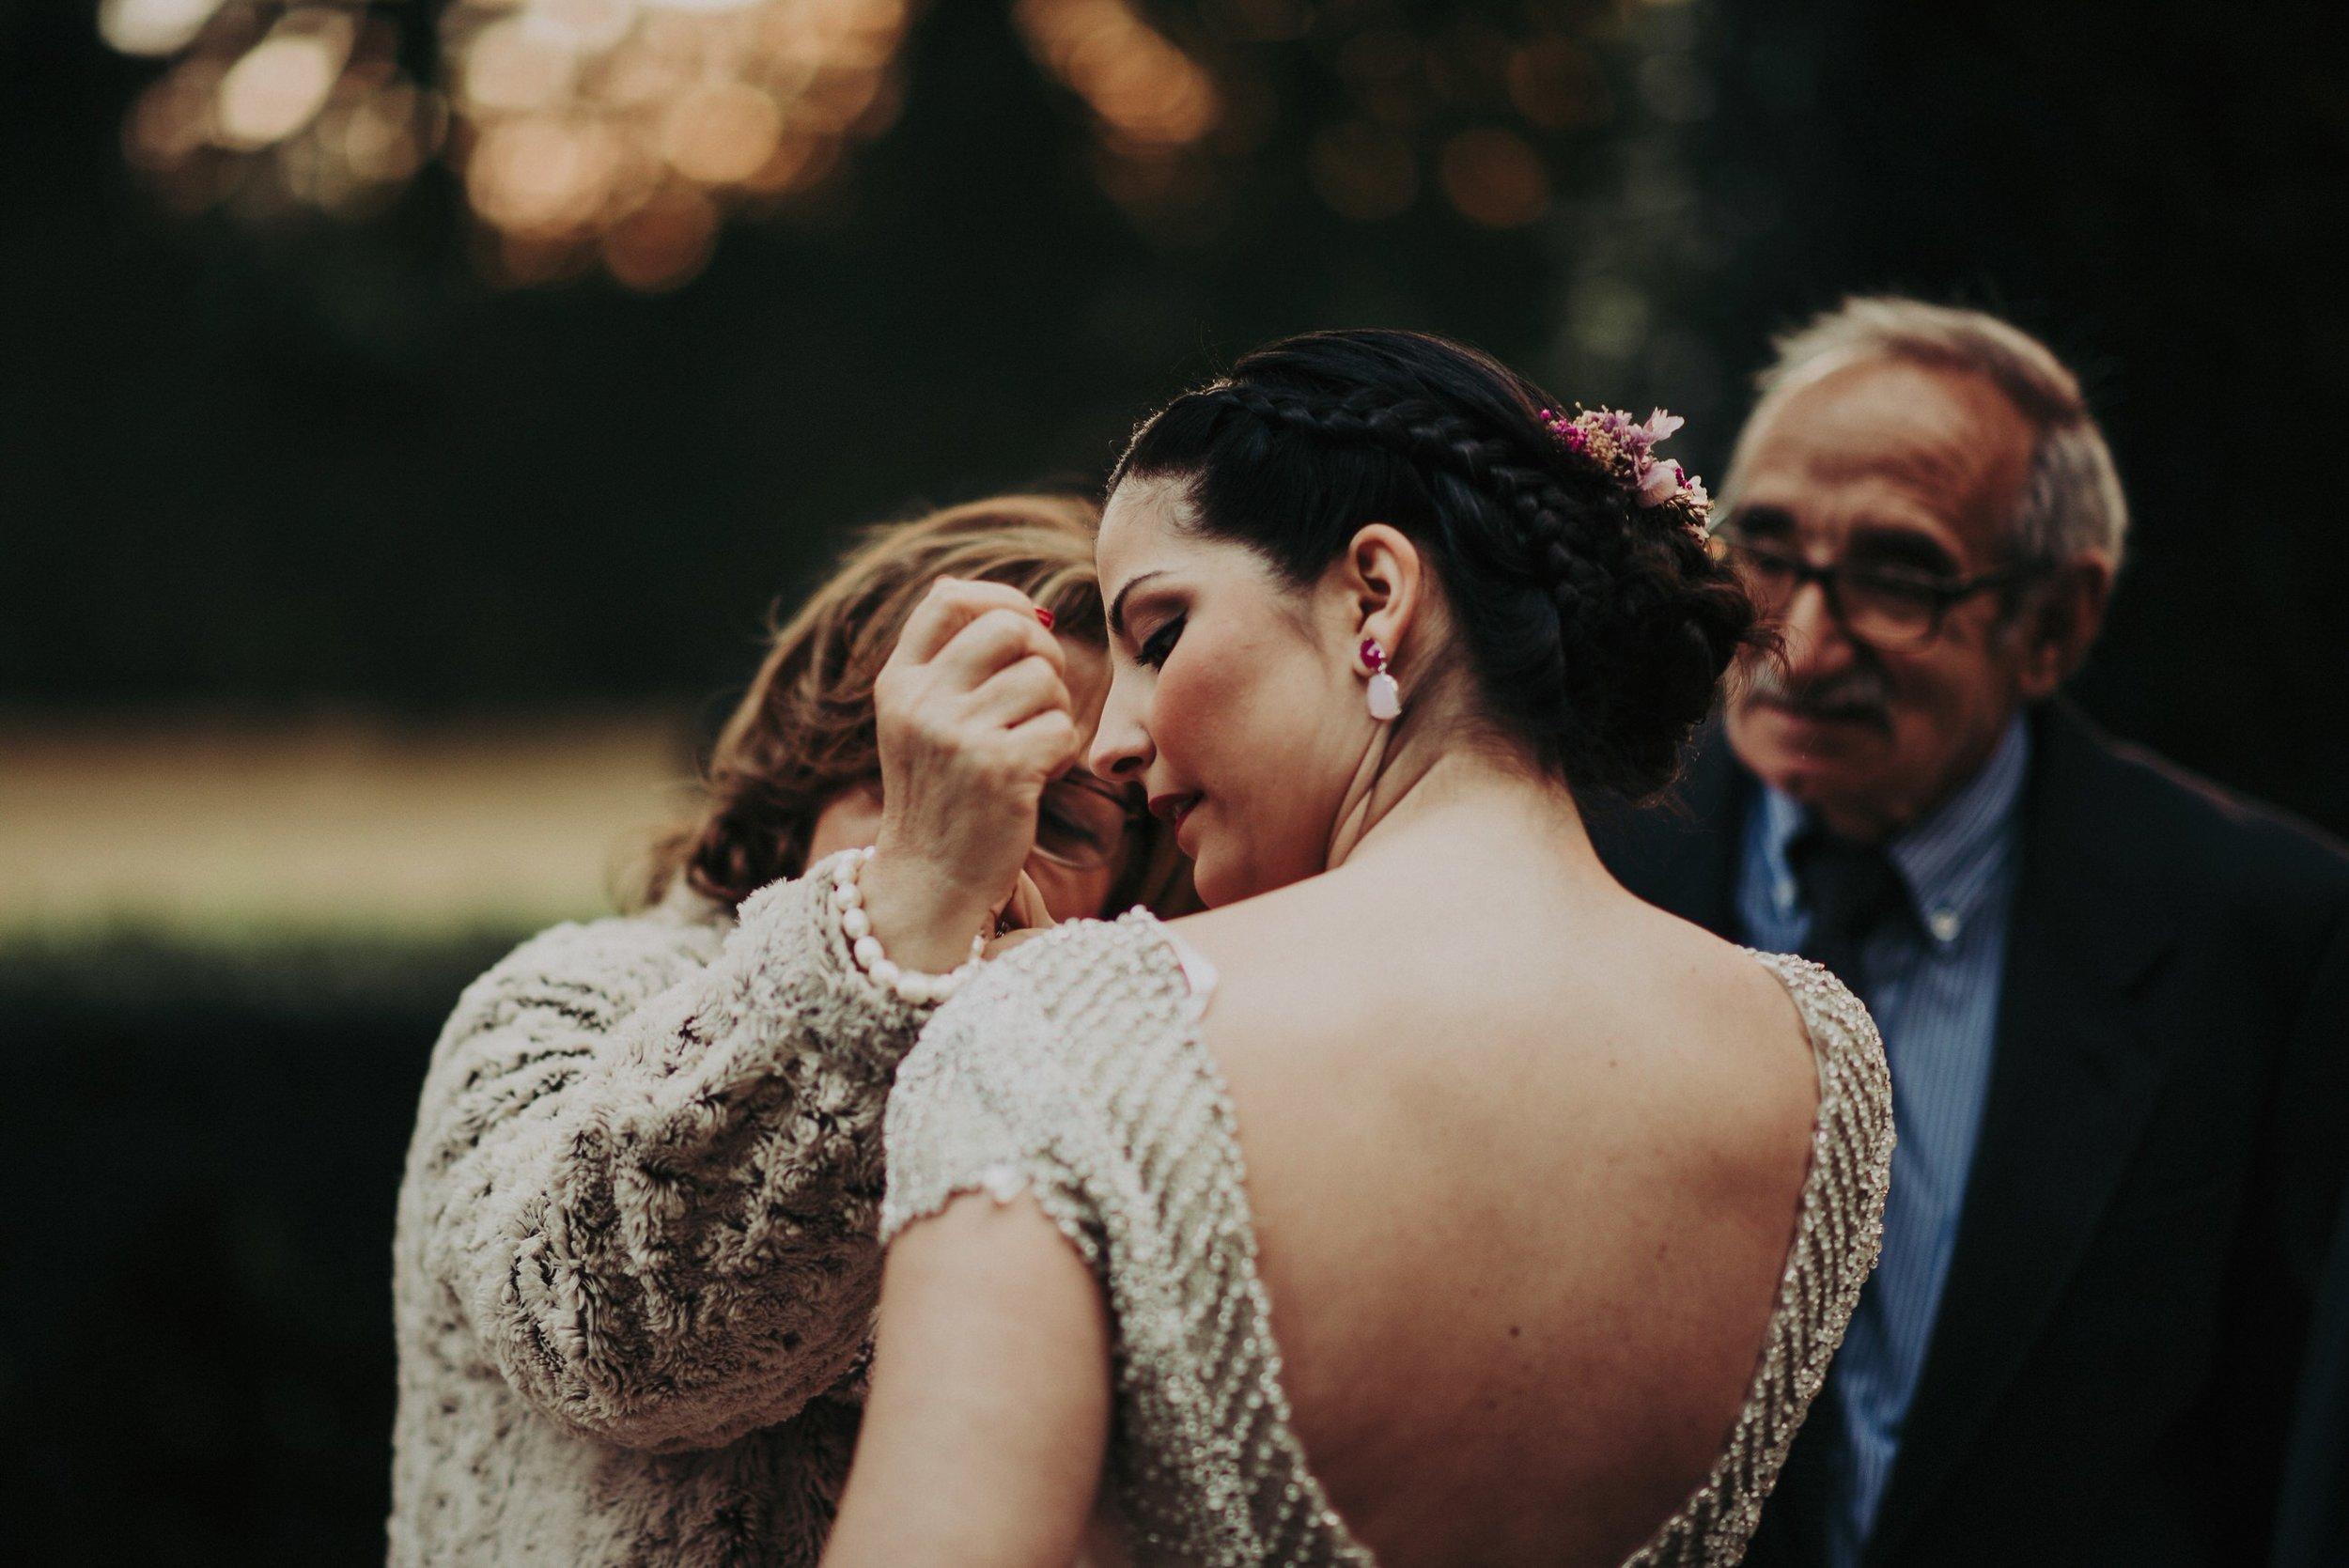 Laura & Rubén - boda en utrera - Santa clotilde- Manolo mayo - Fotografo de boda - Andrés Amarillo AAA_1075-Exposure (88).jpg